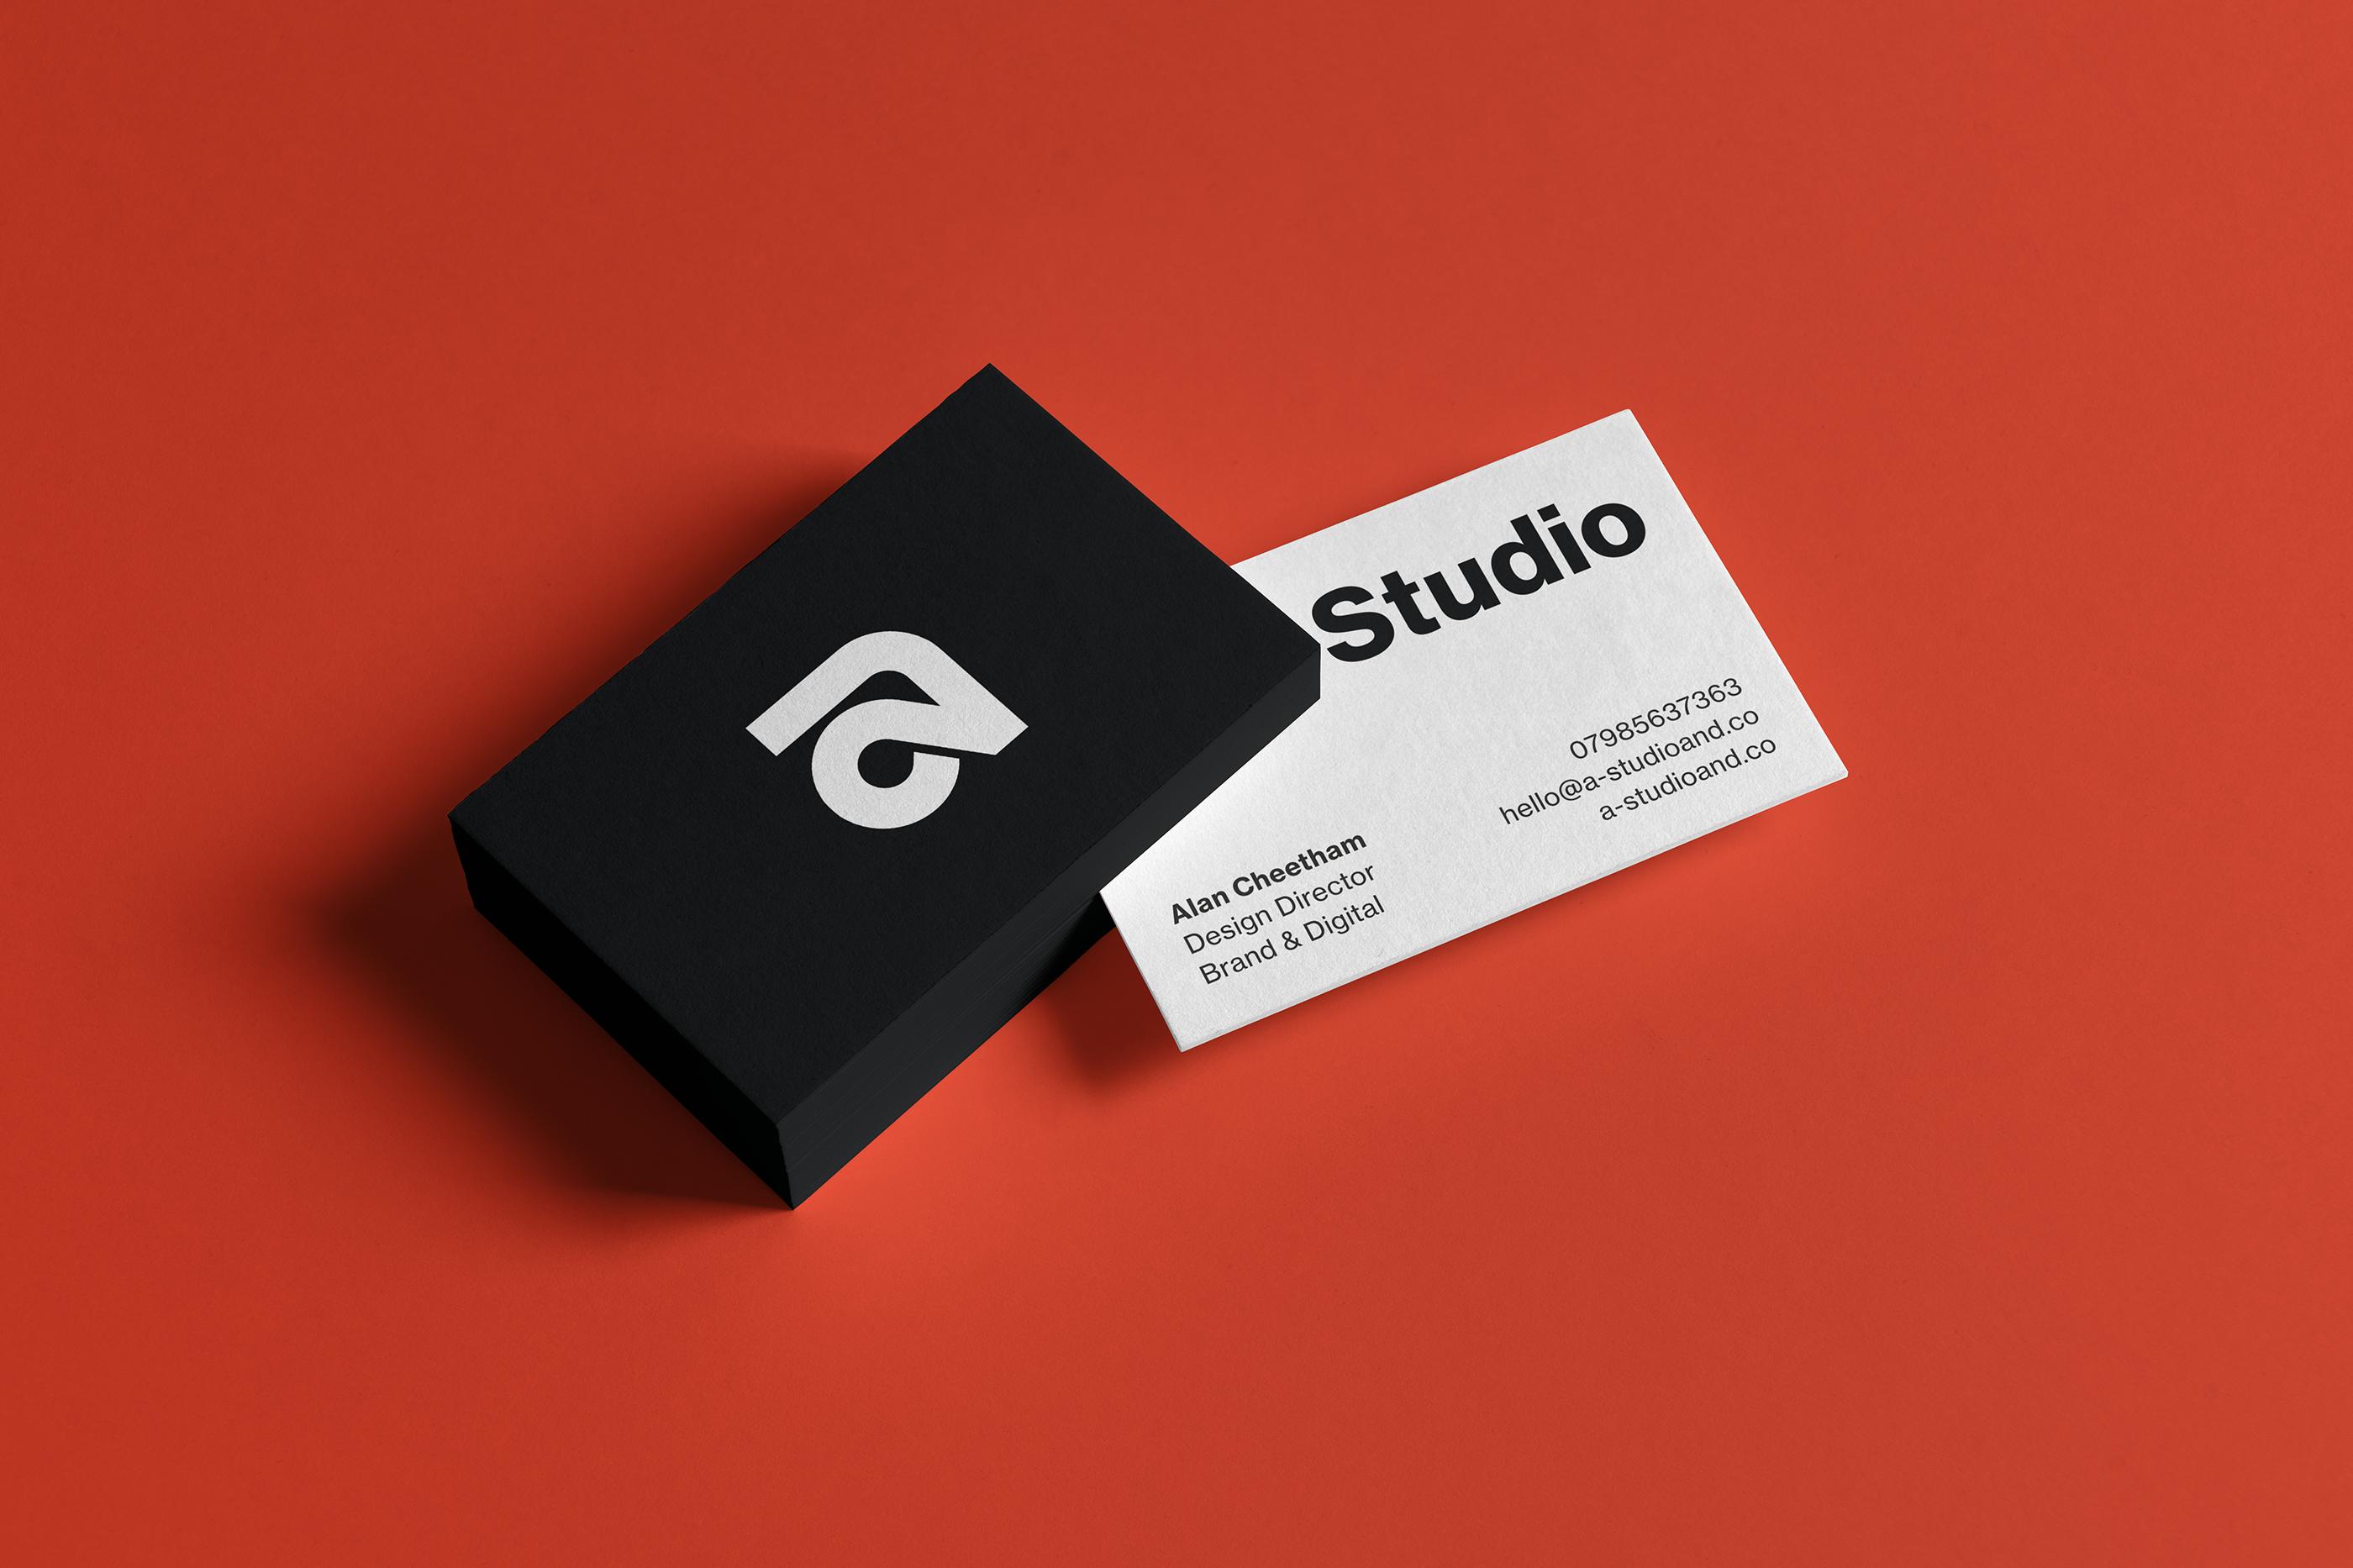 A Studio Business Card Business Card Design Inspiration Business Card Design Business Card Gallery Business Card Inspiration